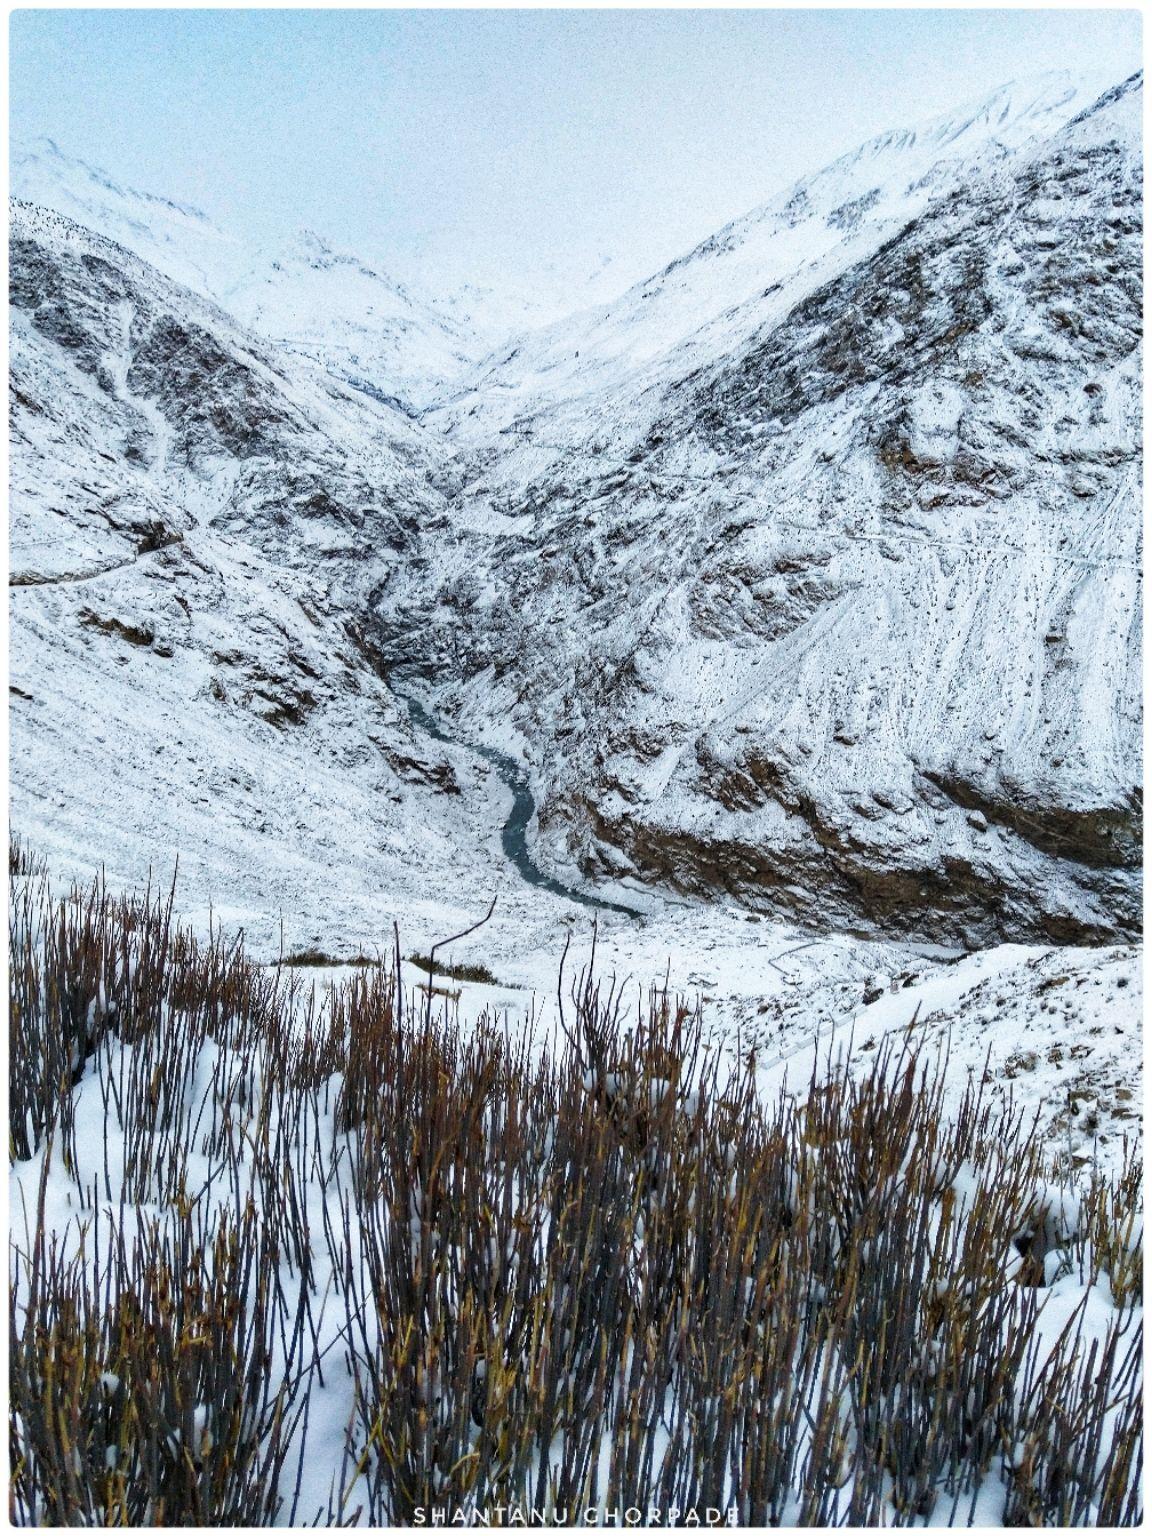 Photo of Himachal Pradesh By shantanu Ghorpade